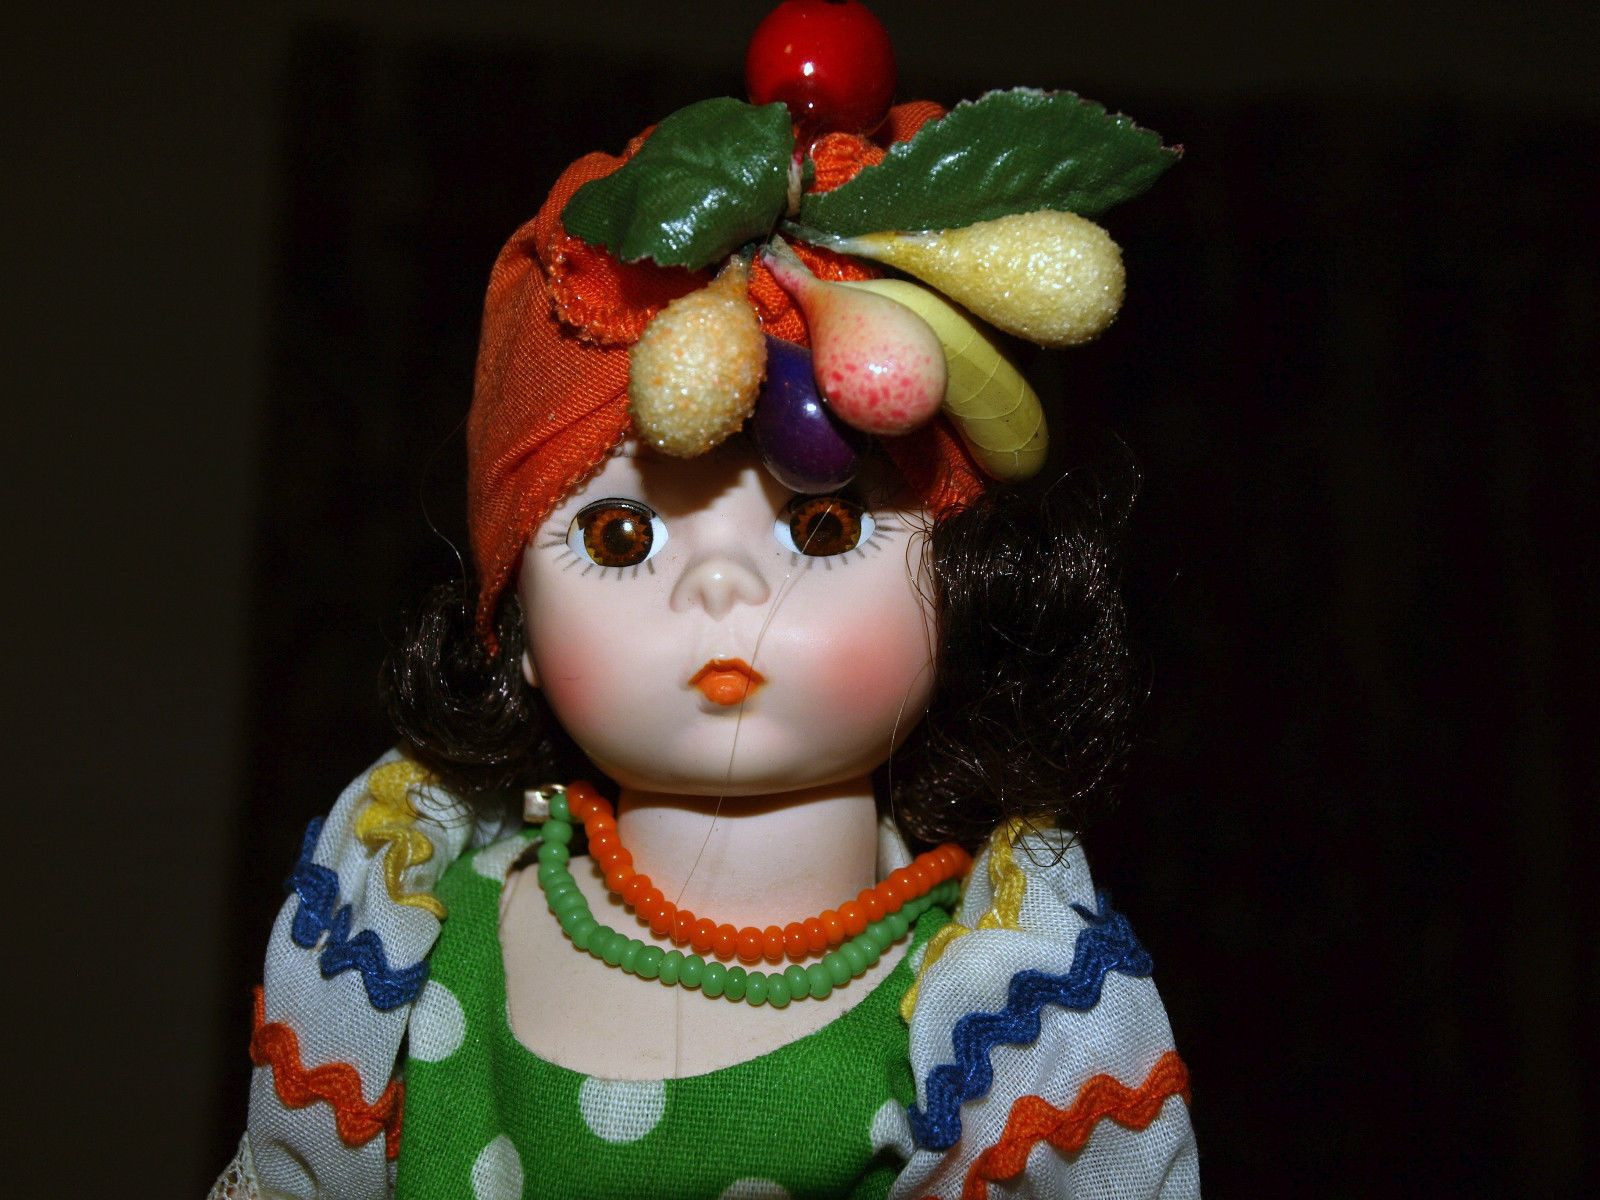 Vintage Madame Alexander Alexanderkins Brazil | eBay